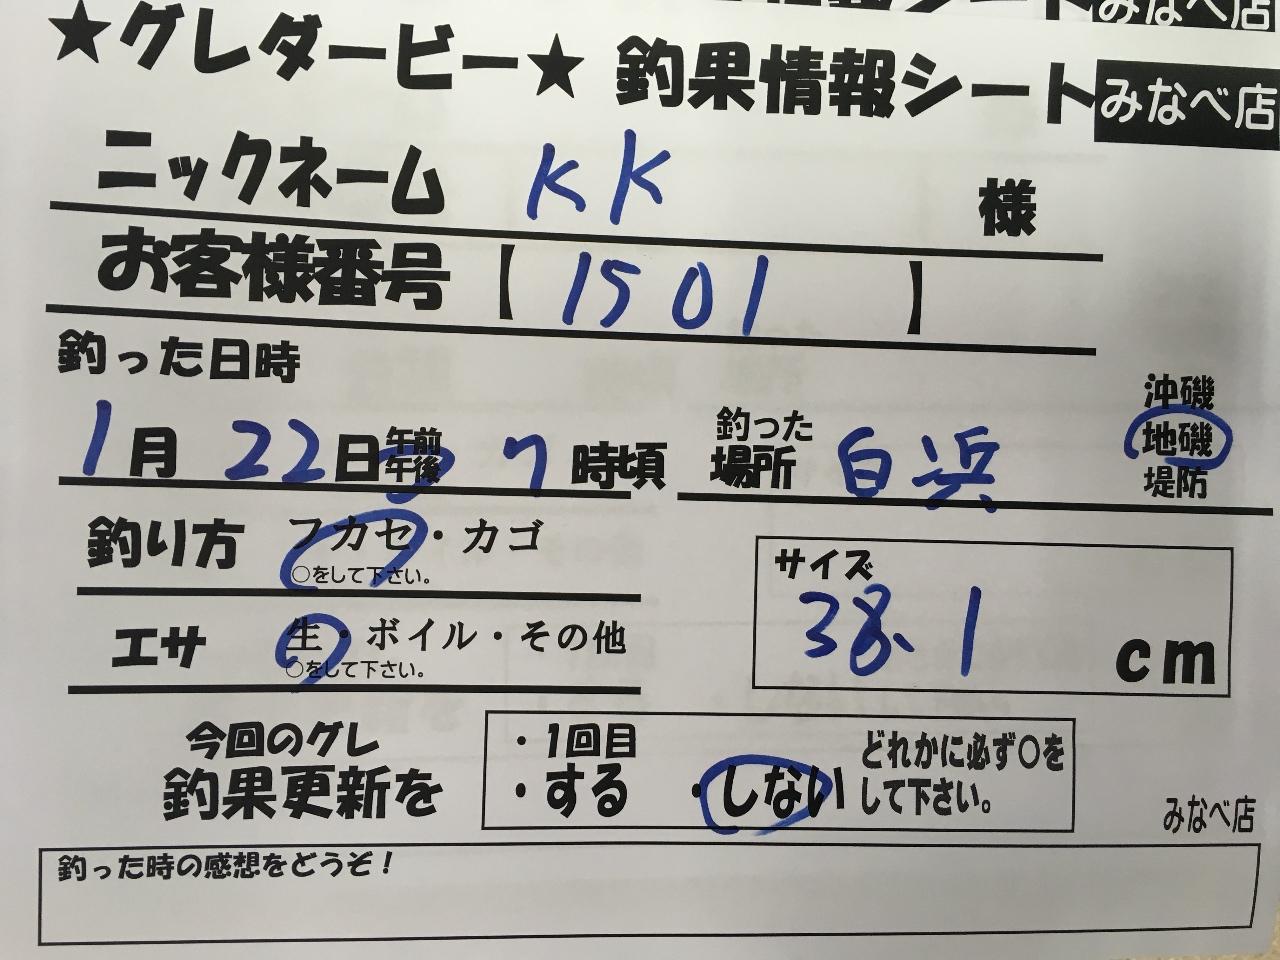 1/22 KK様 第2回グレダービー2020釣果(白浜地磯)38.1cm